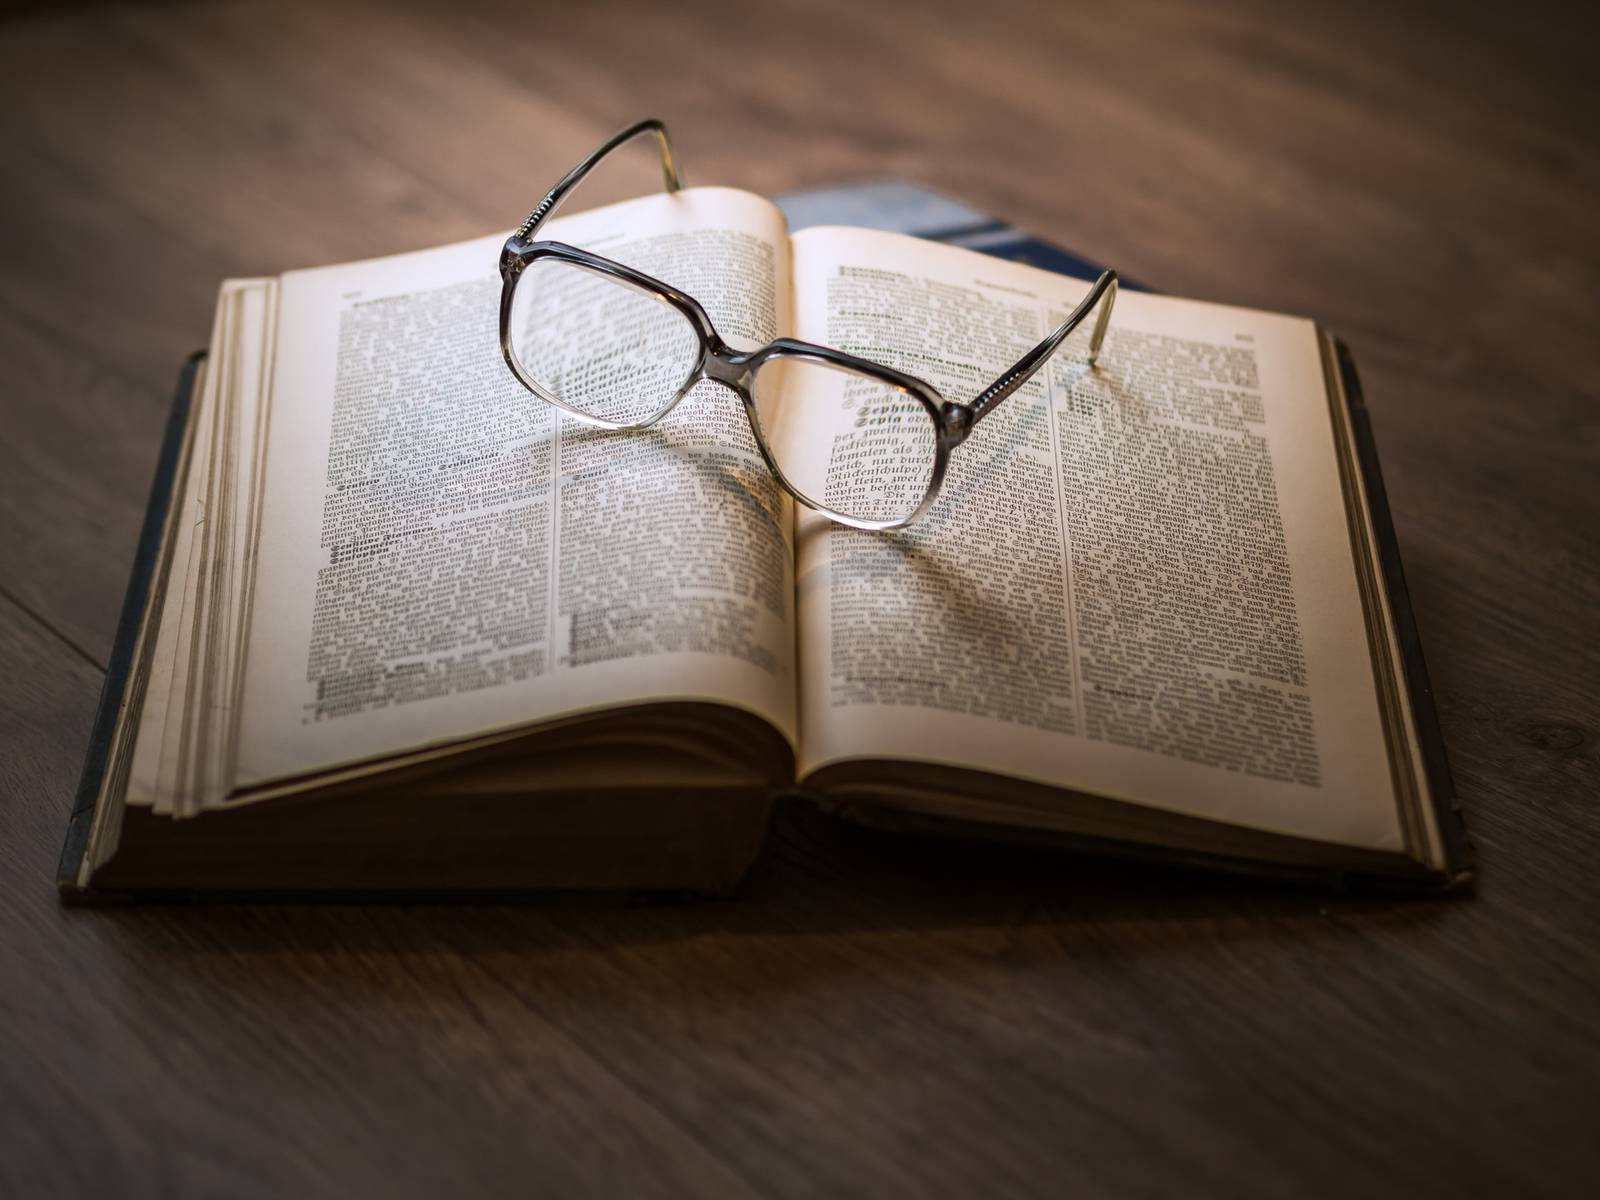 Solutions to presbyopia